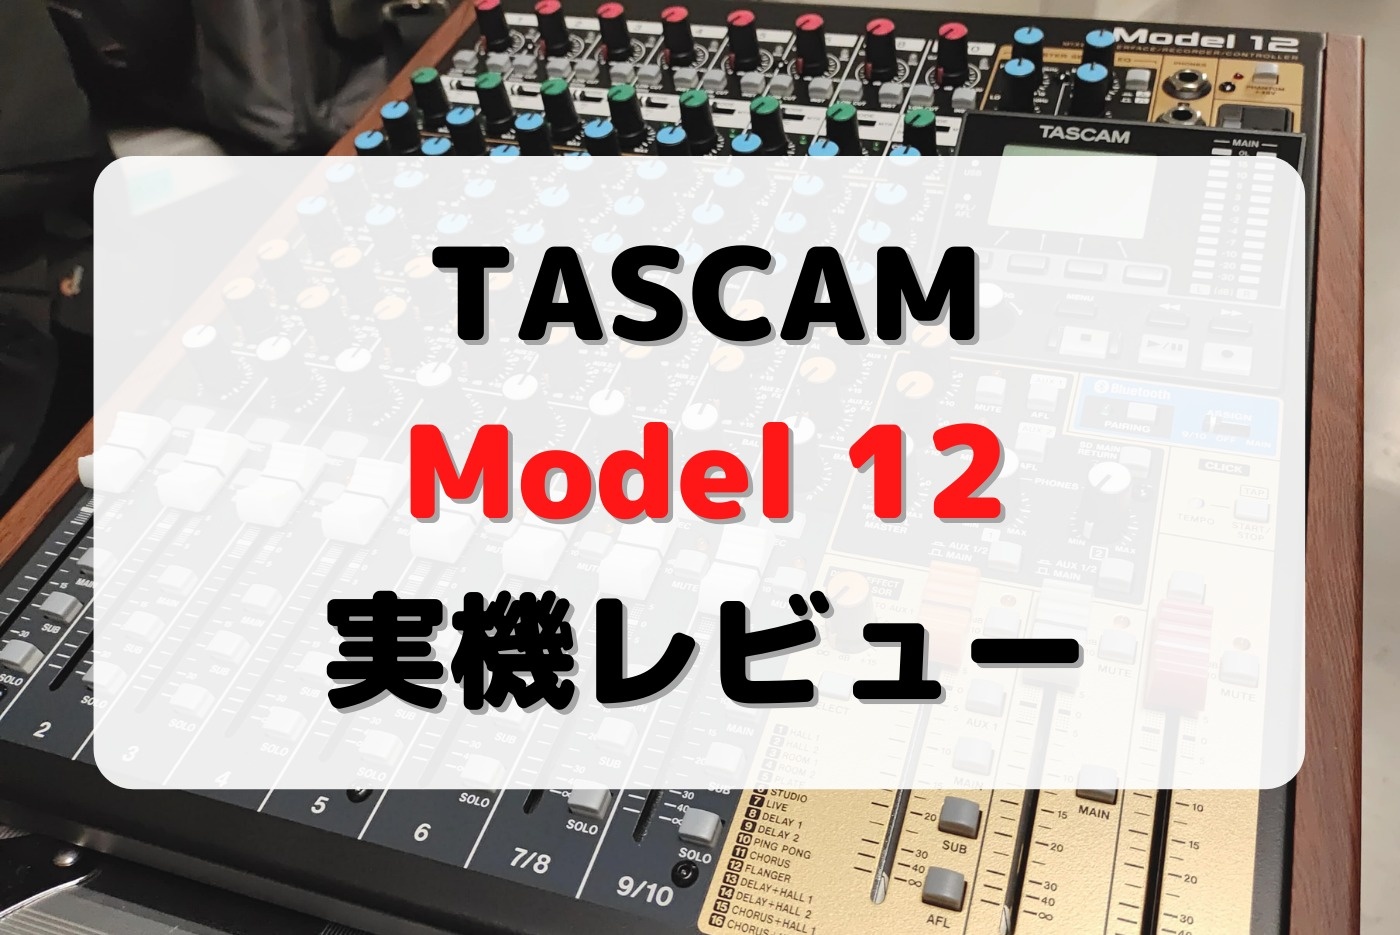 Model 12